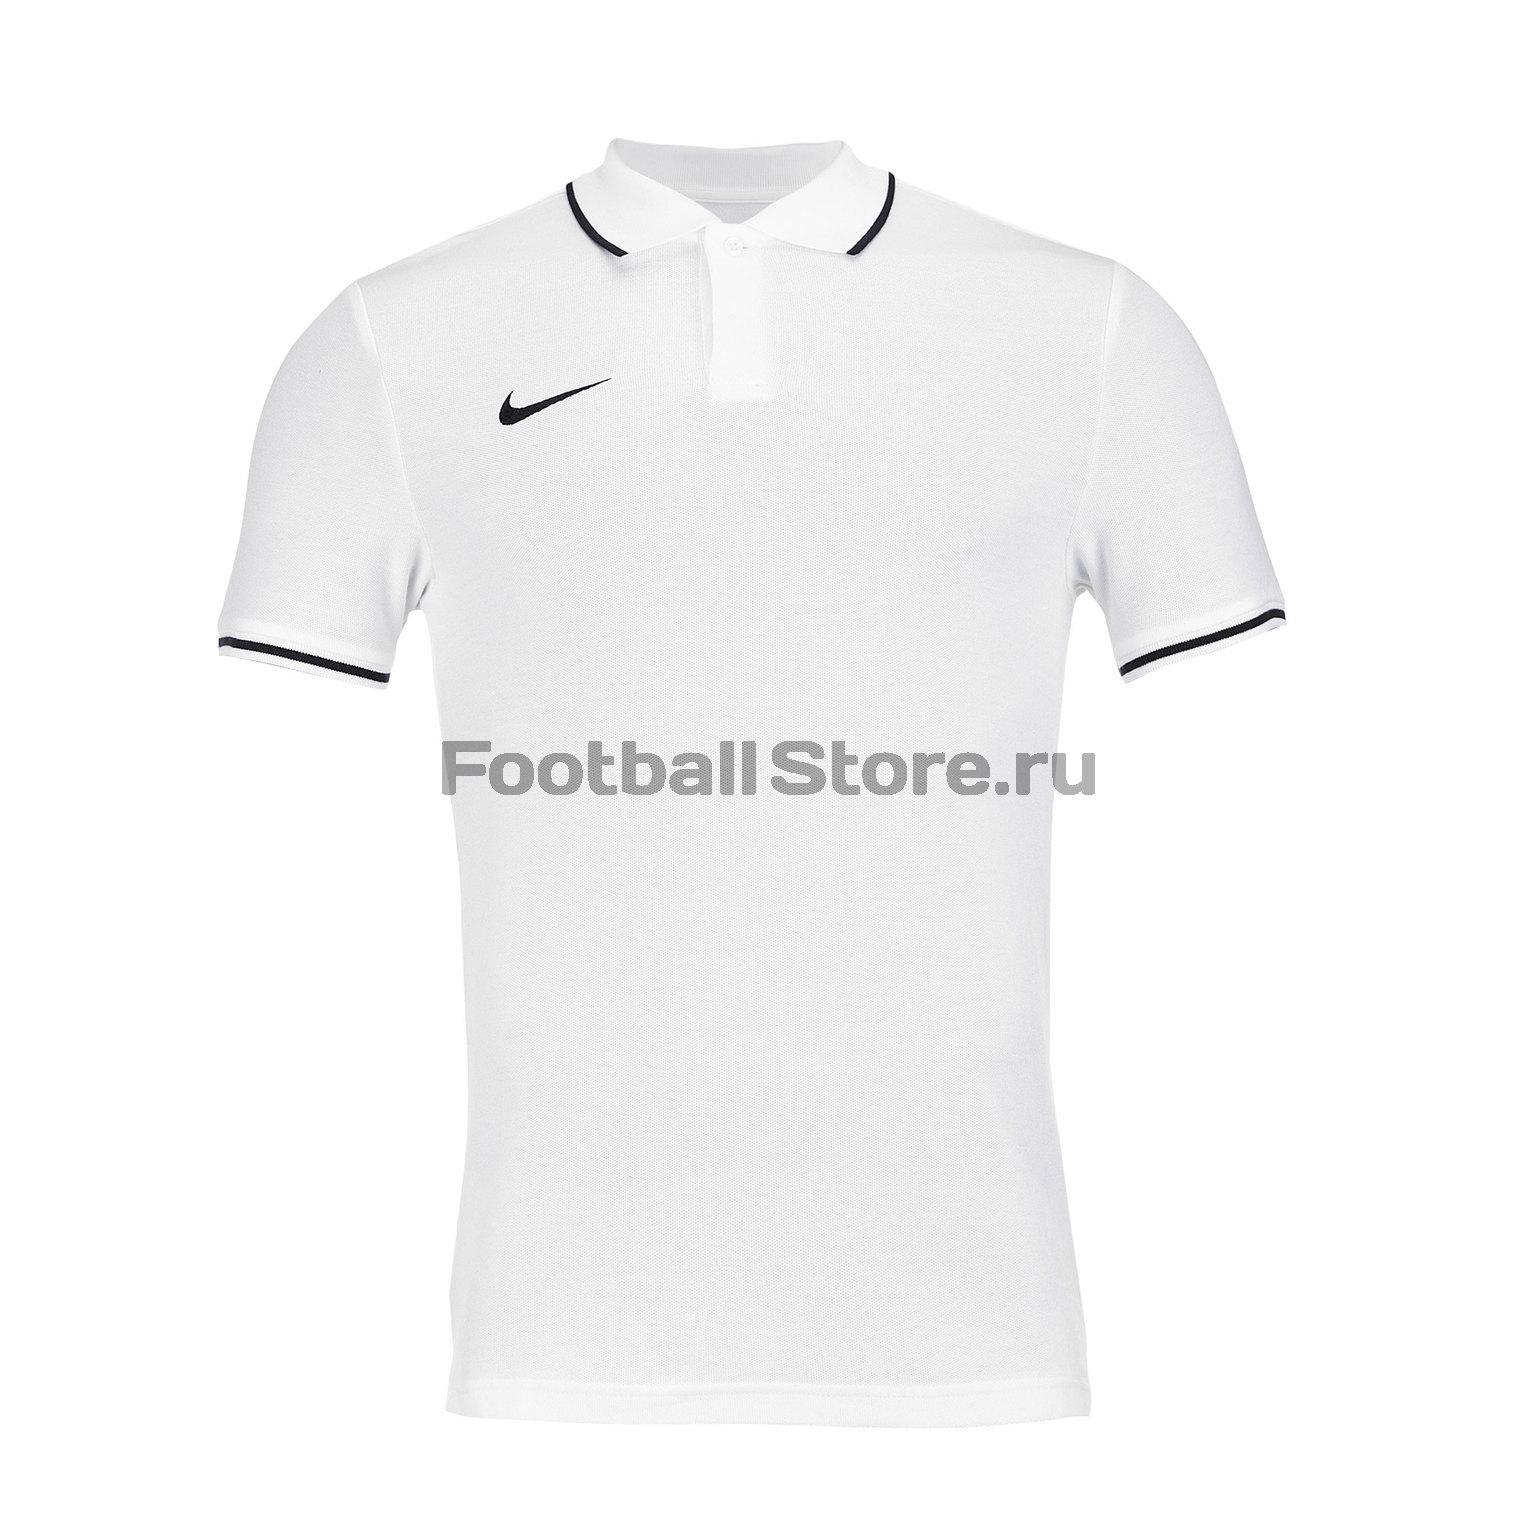 Поло Nike M Polo Club19 SS AJ1502-100 футболка хлопковая nike tee club19 ss aj1504 451